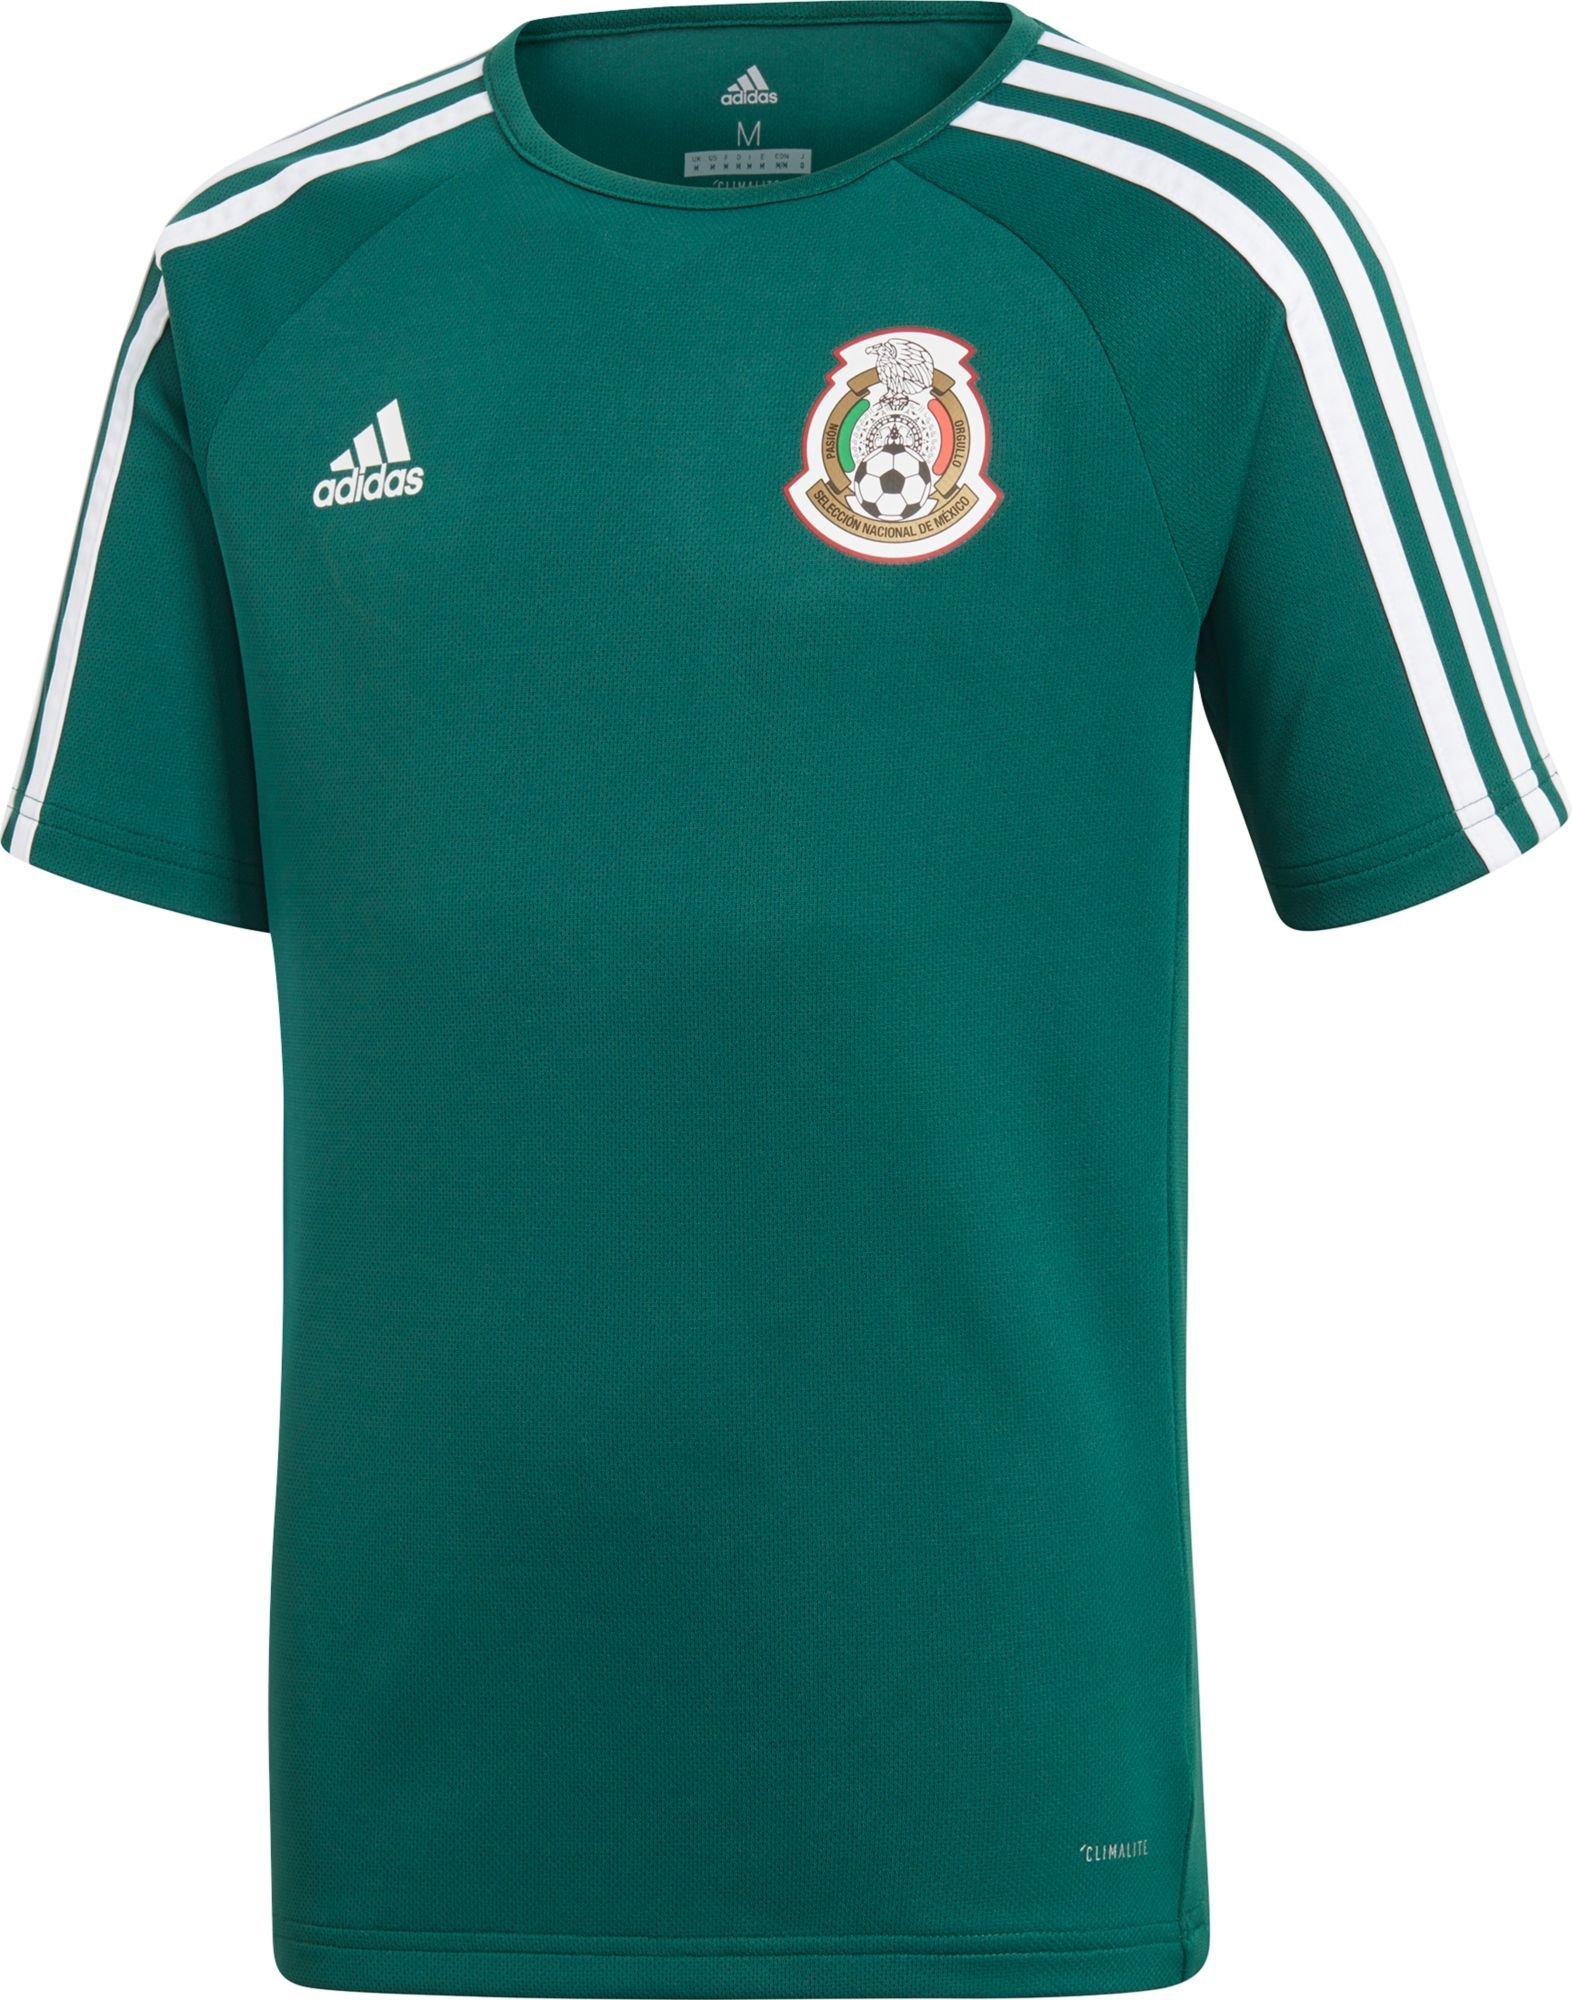 adidas Kids Boy's Mexico Home Fanshirt (Little Kids/Big Kids) Collegiate Green/White Medium